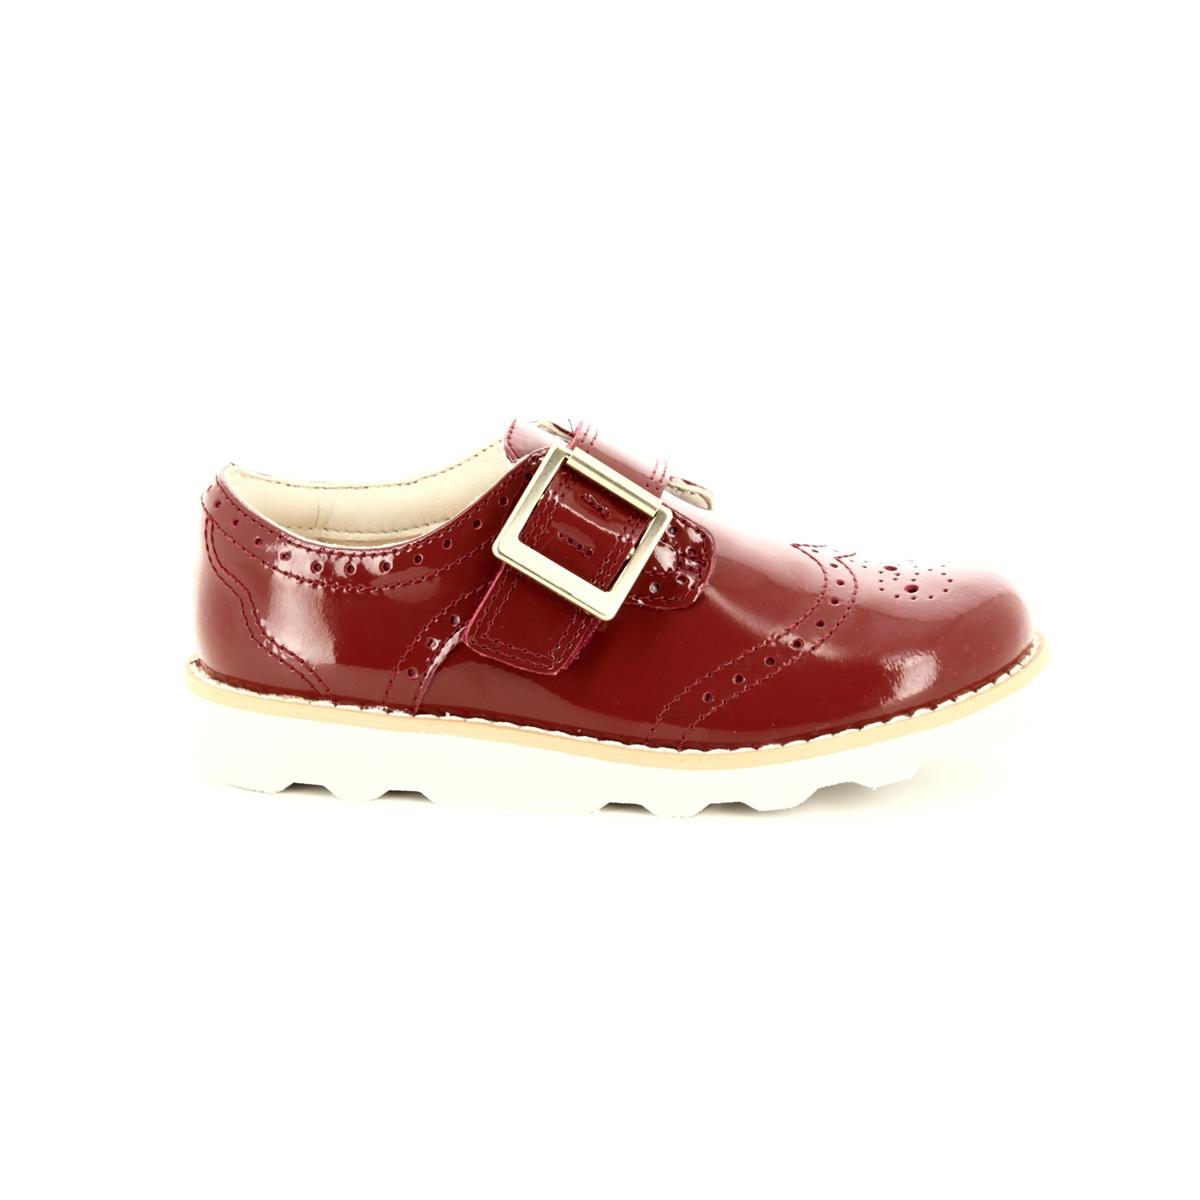 95d09f5e976 Clarks First Shoes - Orange patent - 3578 36F CROWN PRIDE FS